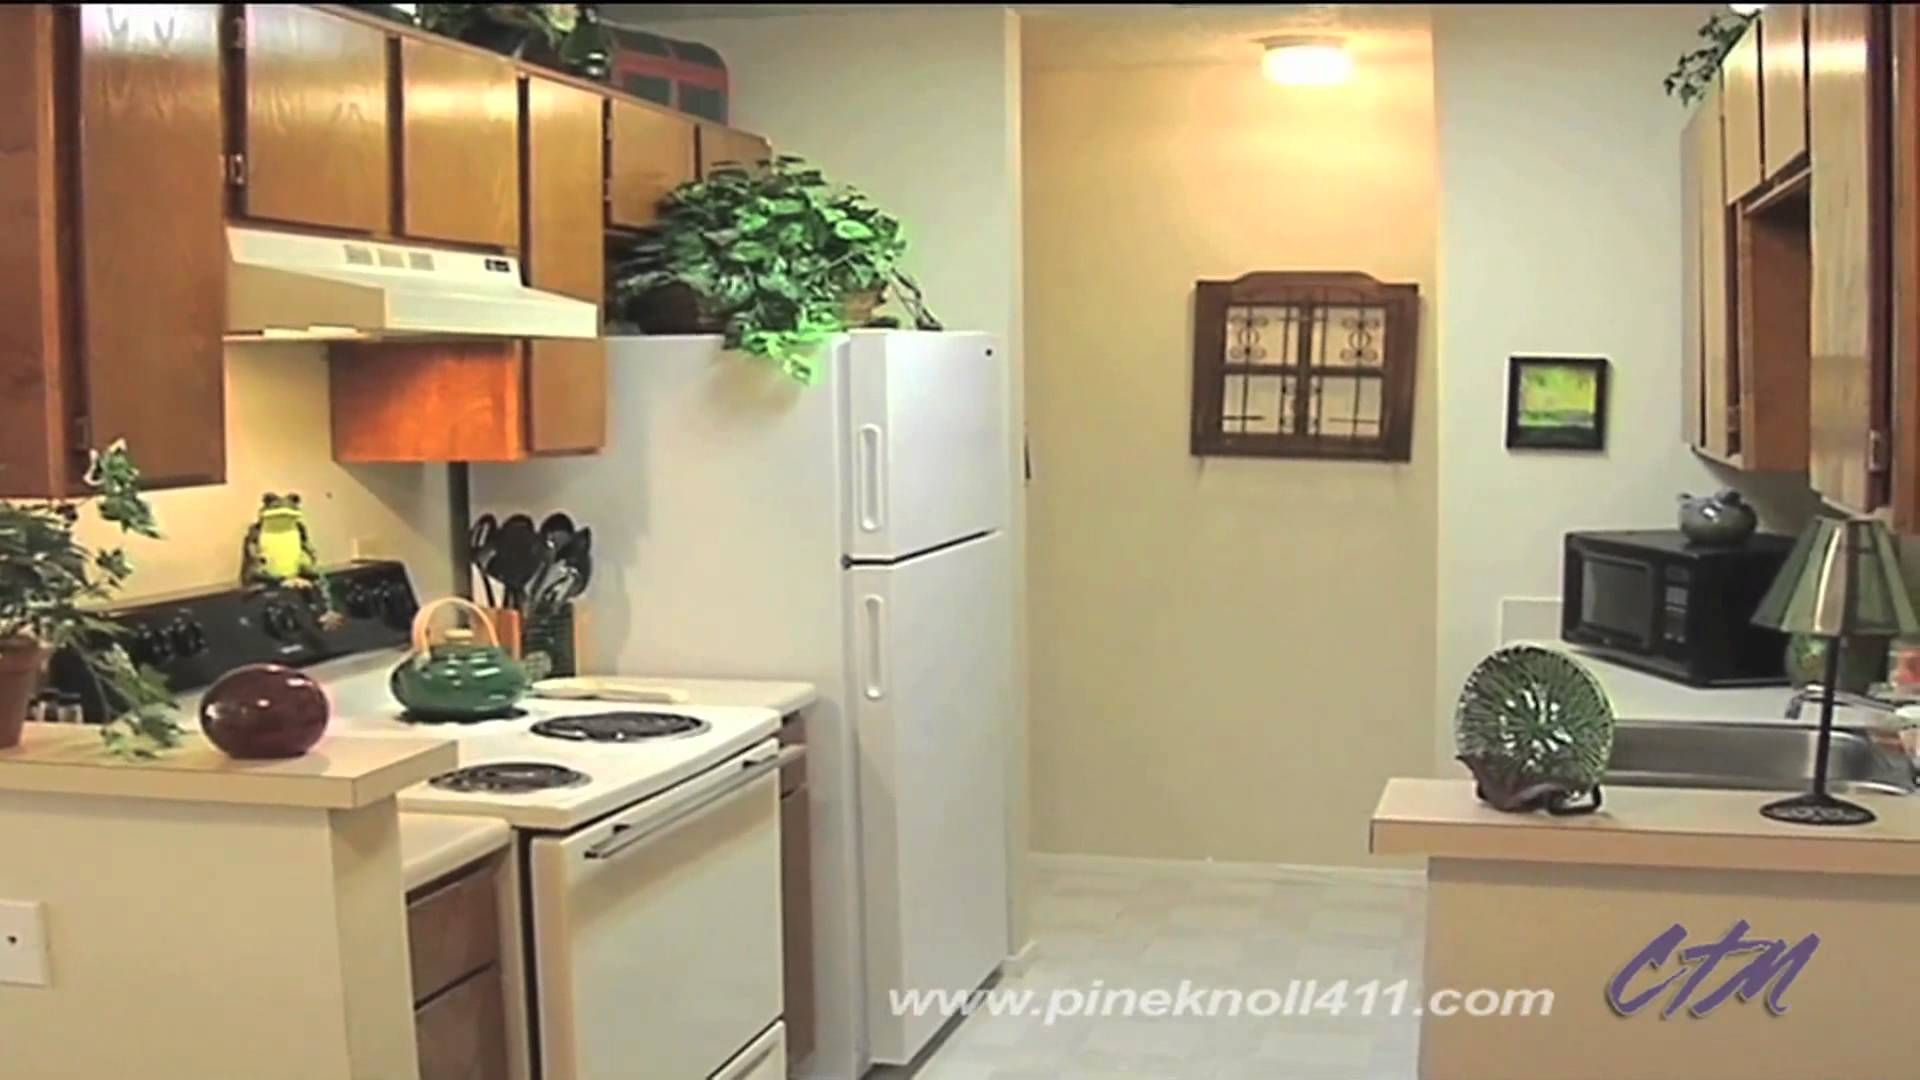 23 Apartment Videos Luma Corp Inc Texas Real Estate Apartment Luma